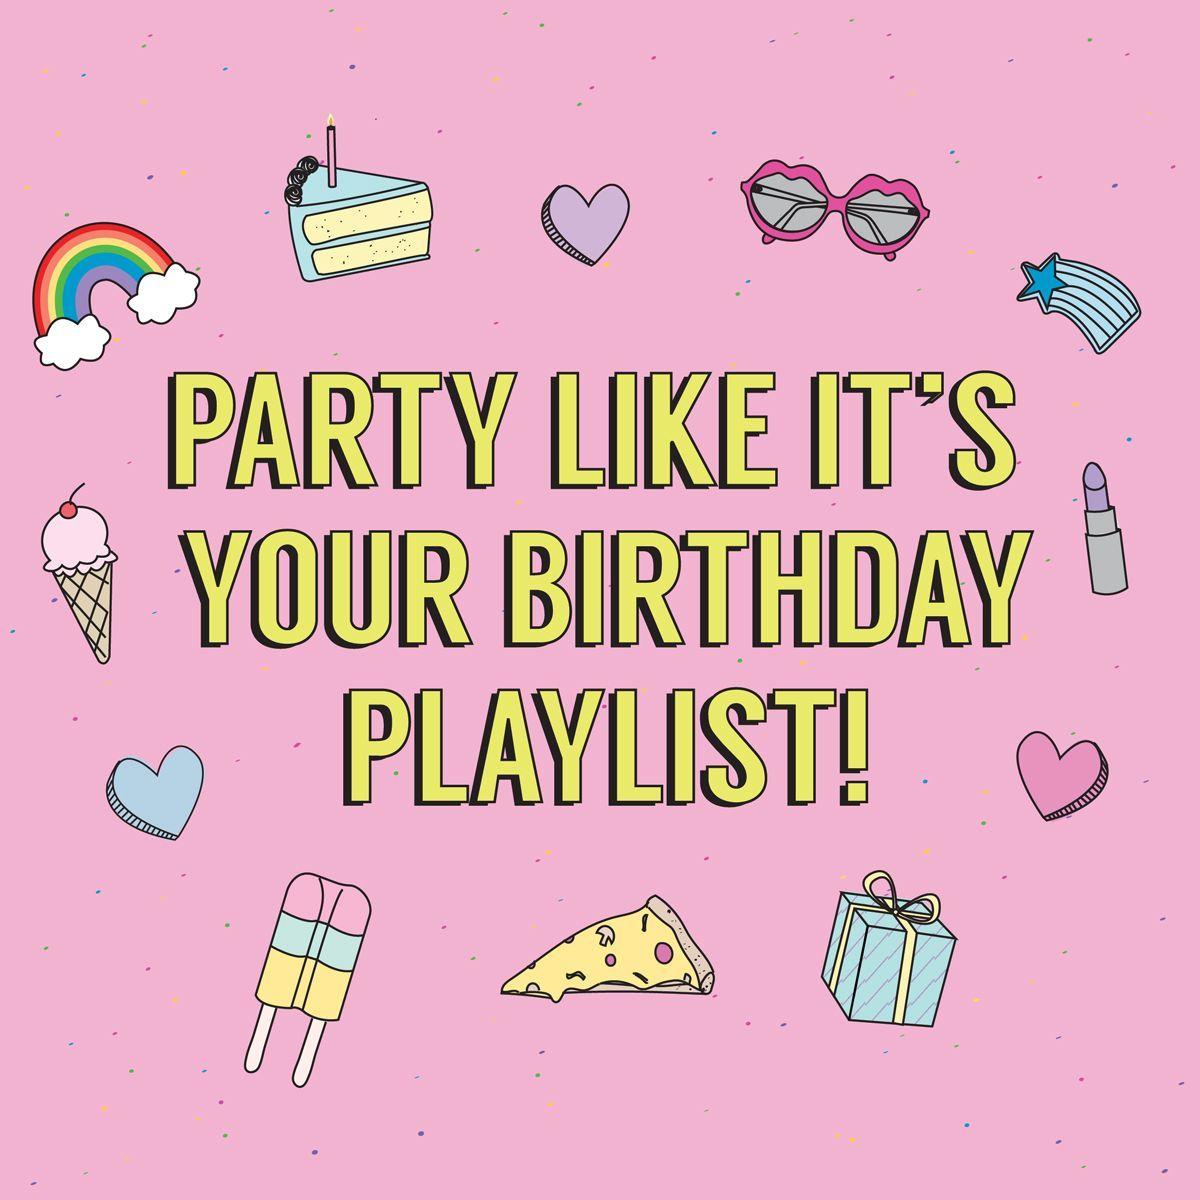 Wedding Song Playlist Ideas: Party Like It's Your Birthday Playlist